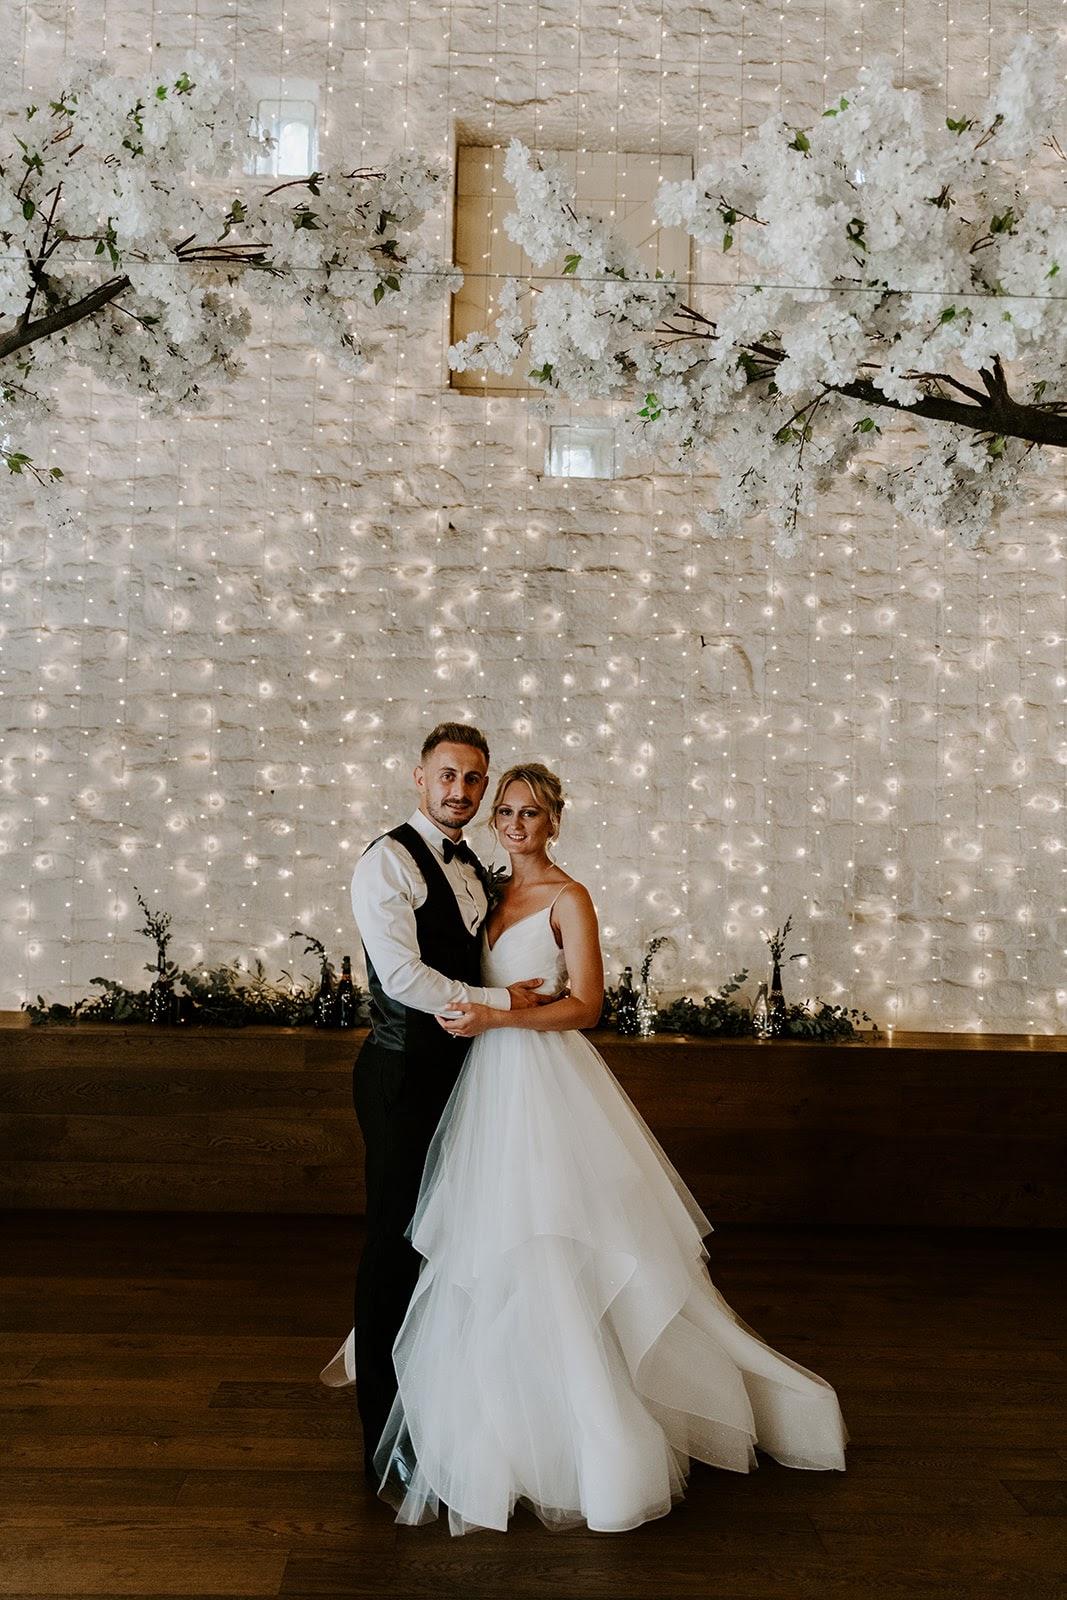 Tom and Hannah Wedding - The Light Paint